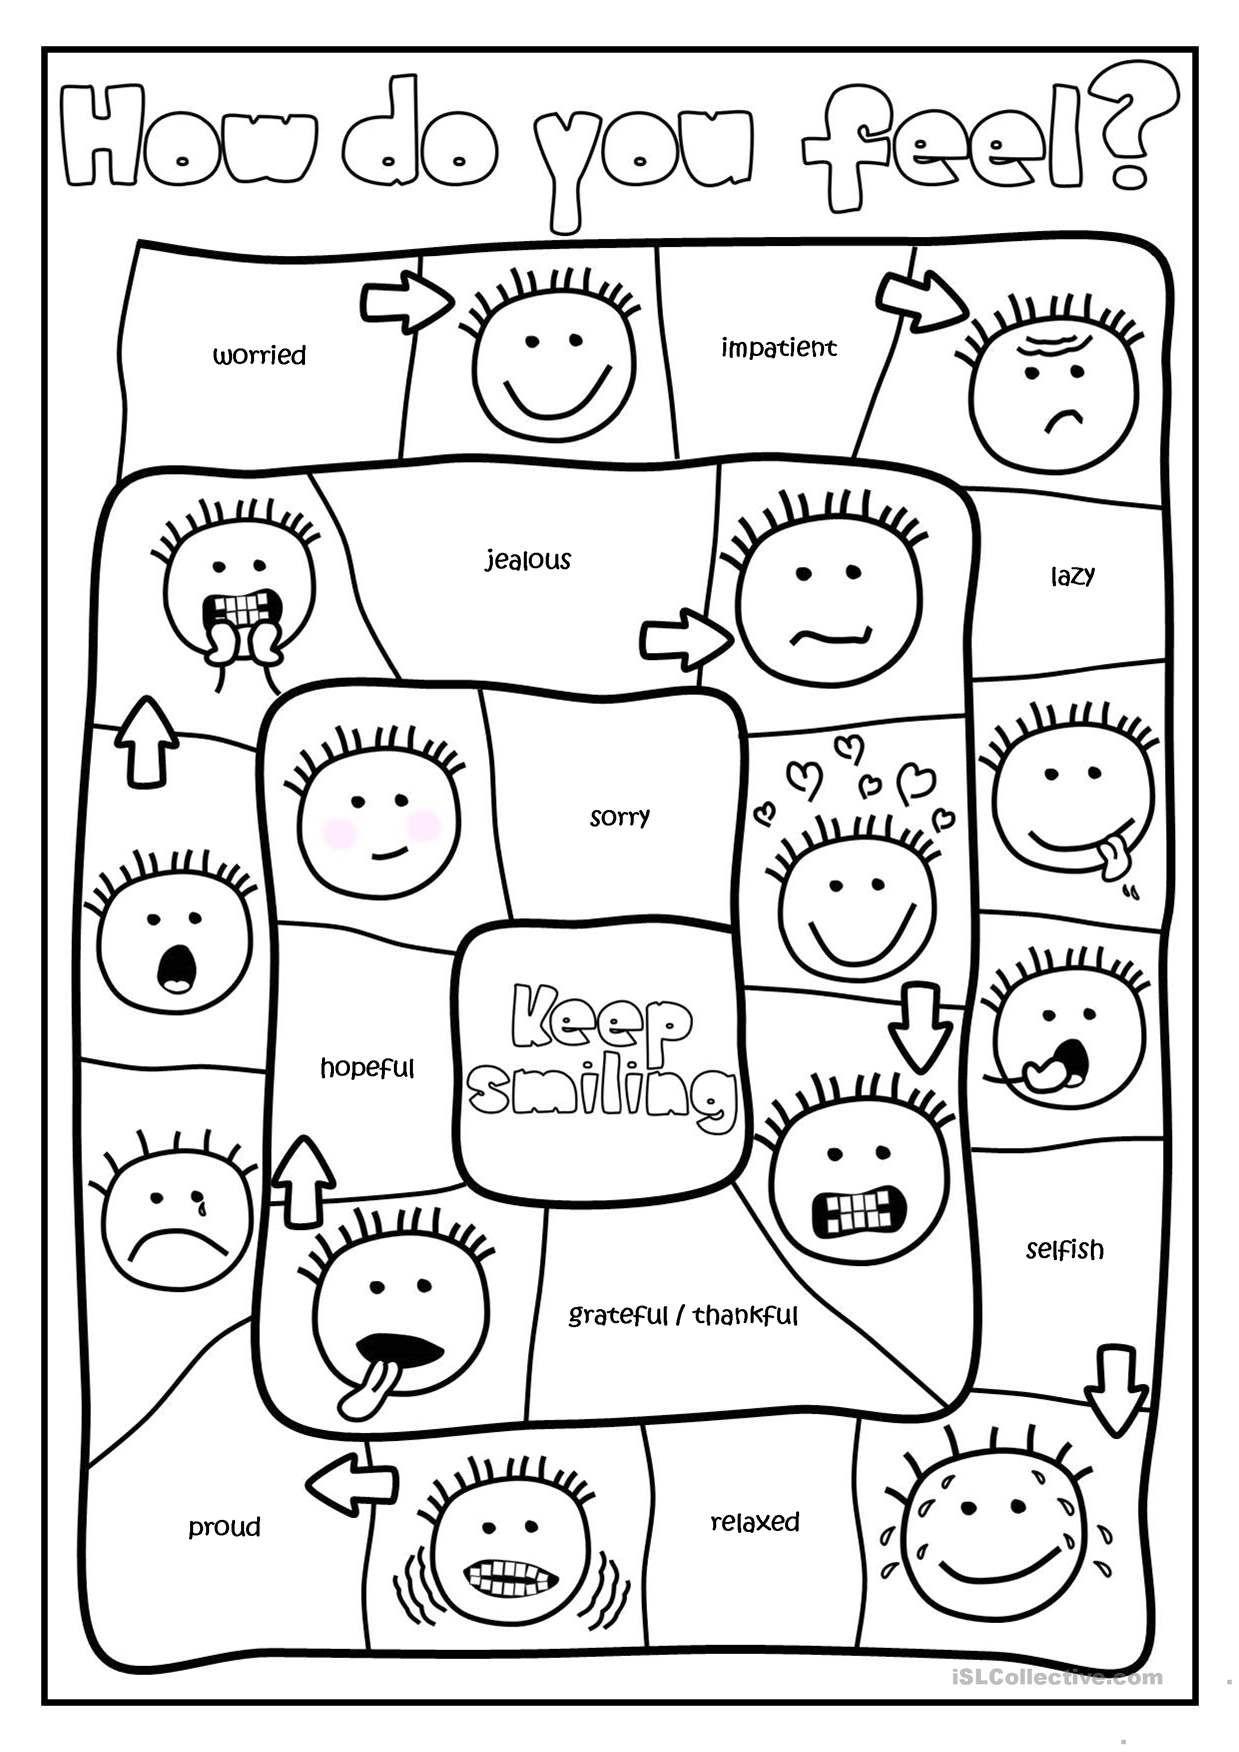 Feelings And Emotions Worksheets For Preschoolers [ 1752 x 1239 Pixel ]